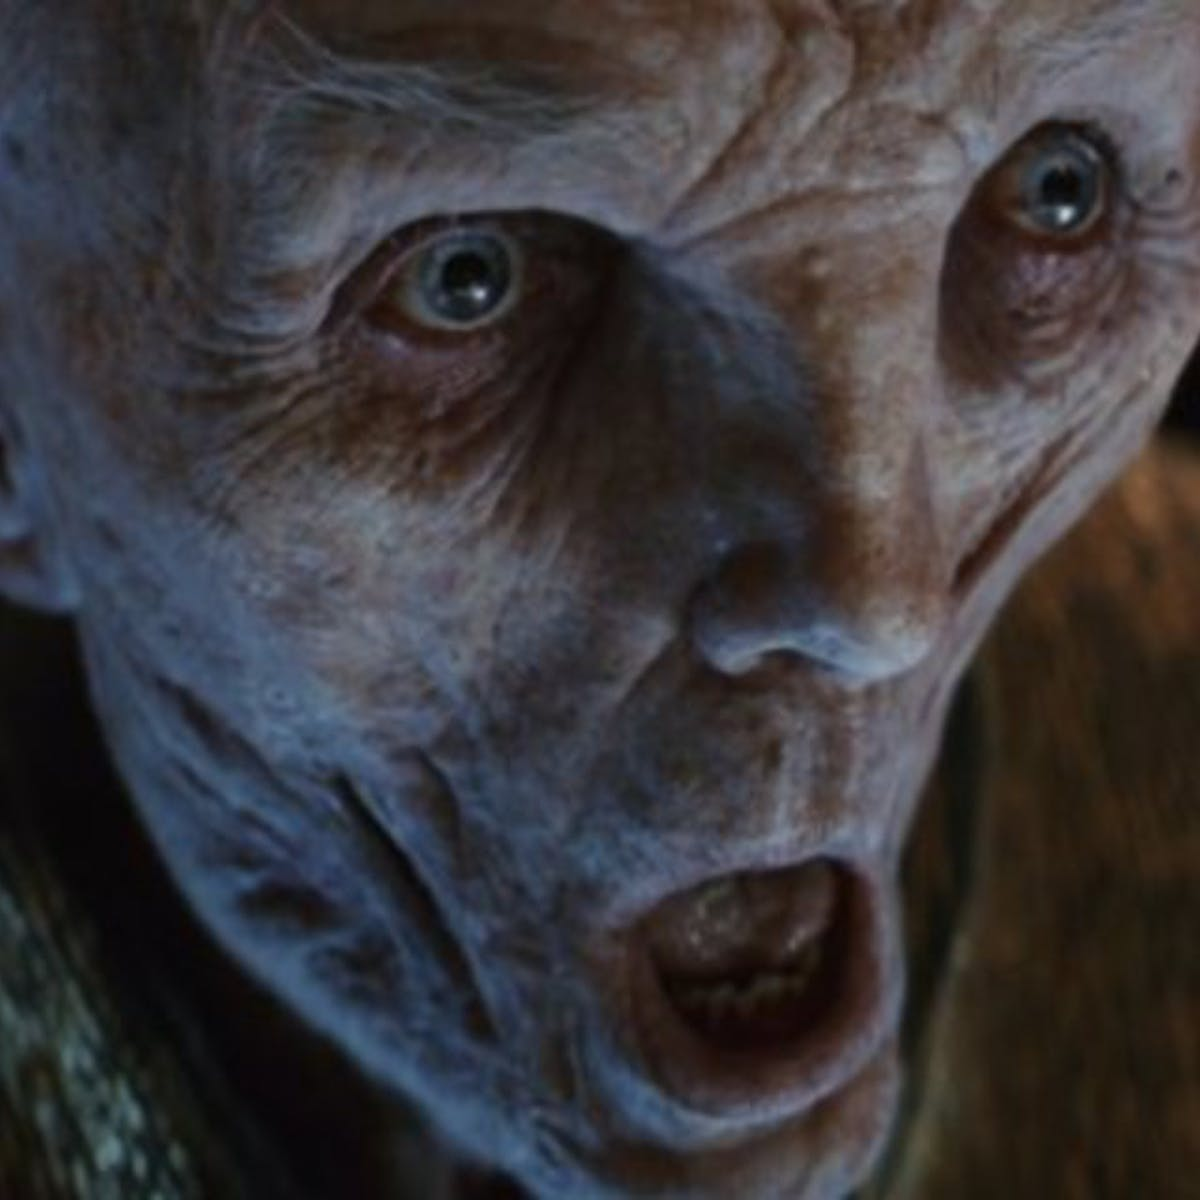 'Star Wars 9' Leaks Reveal How Snoke Leads Kylo to Emperor Palpatine